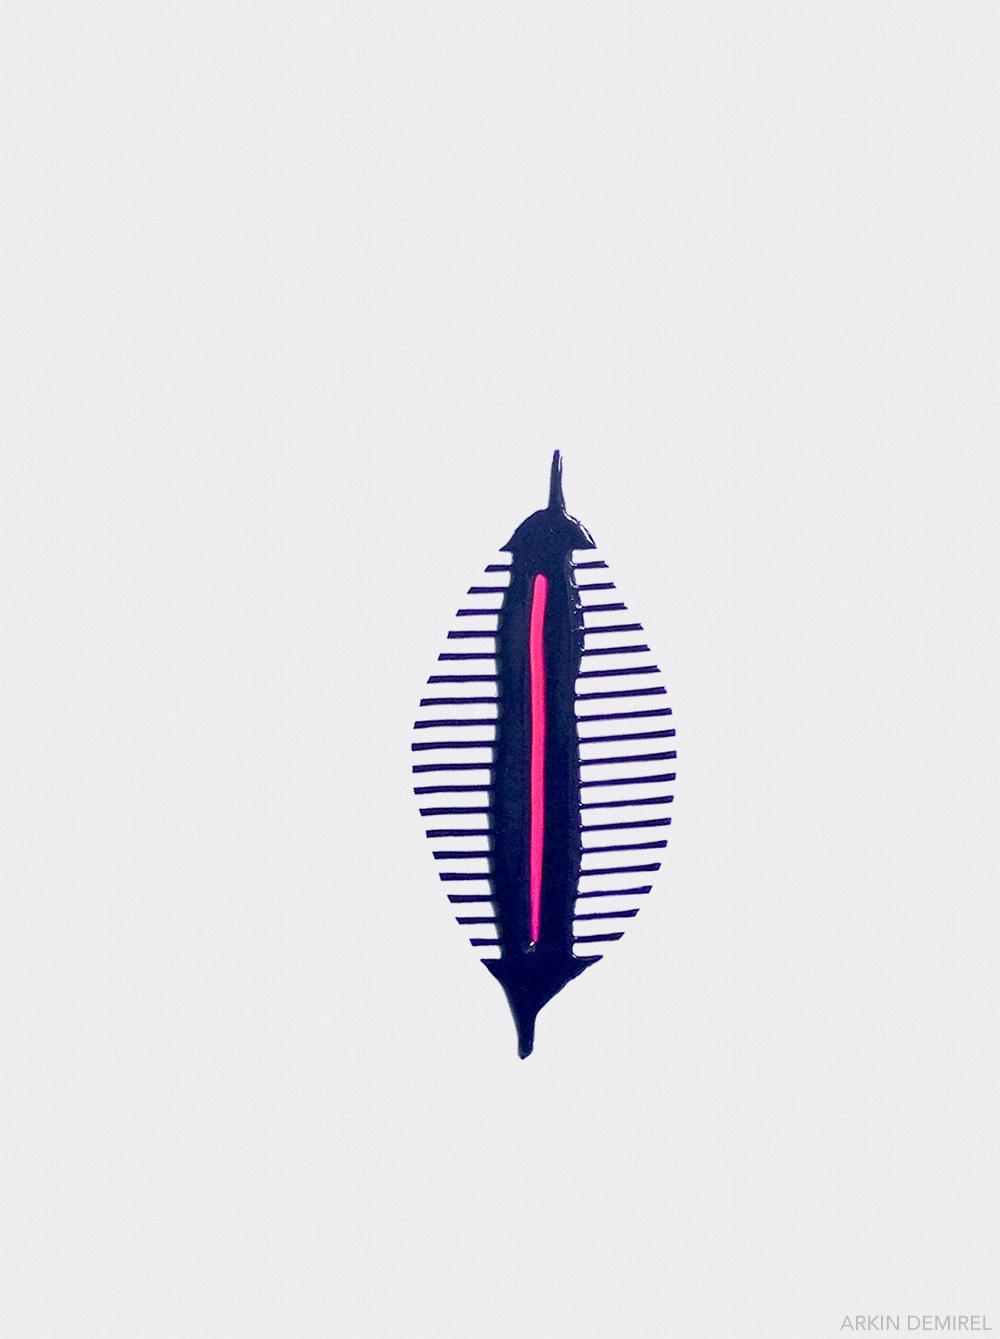 demirel-untitled-purple2_may2015.jpg